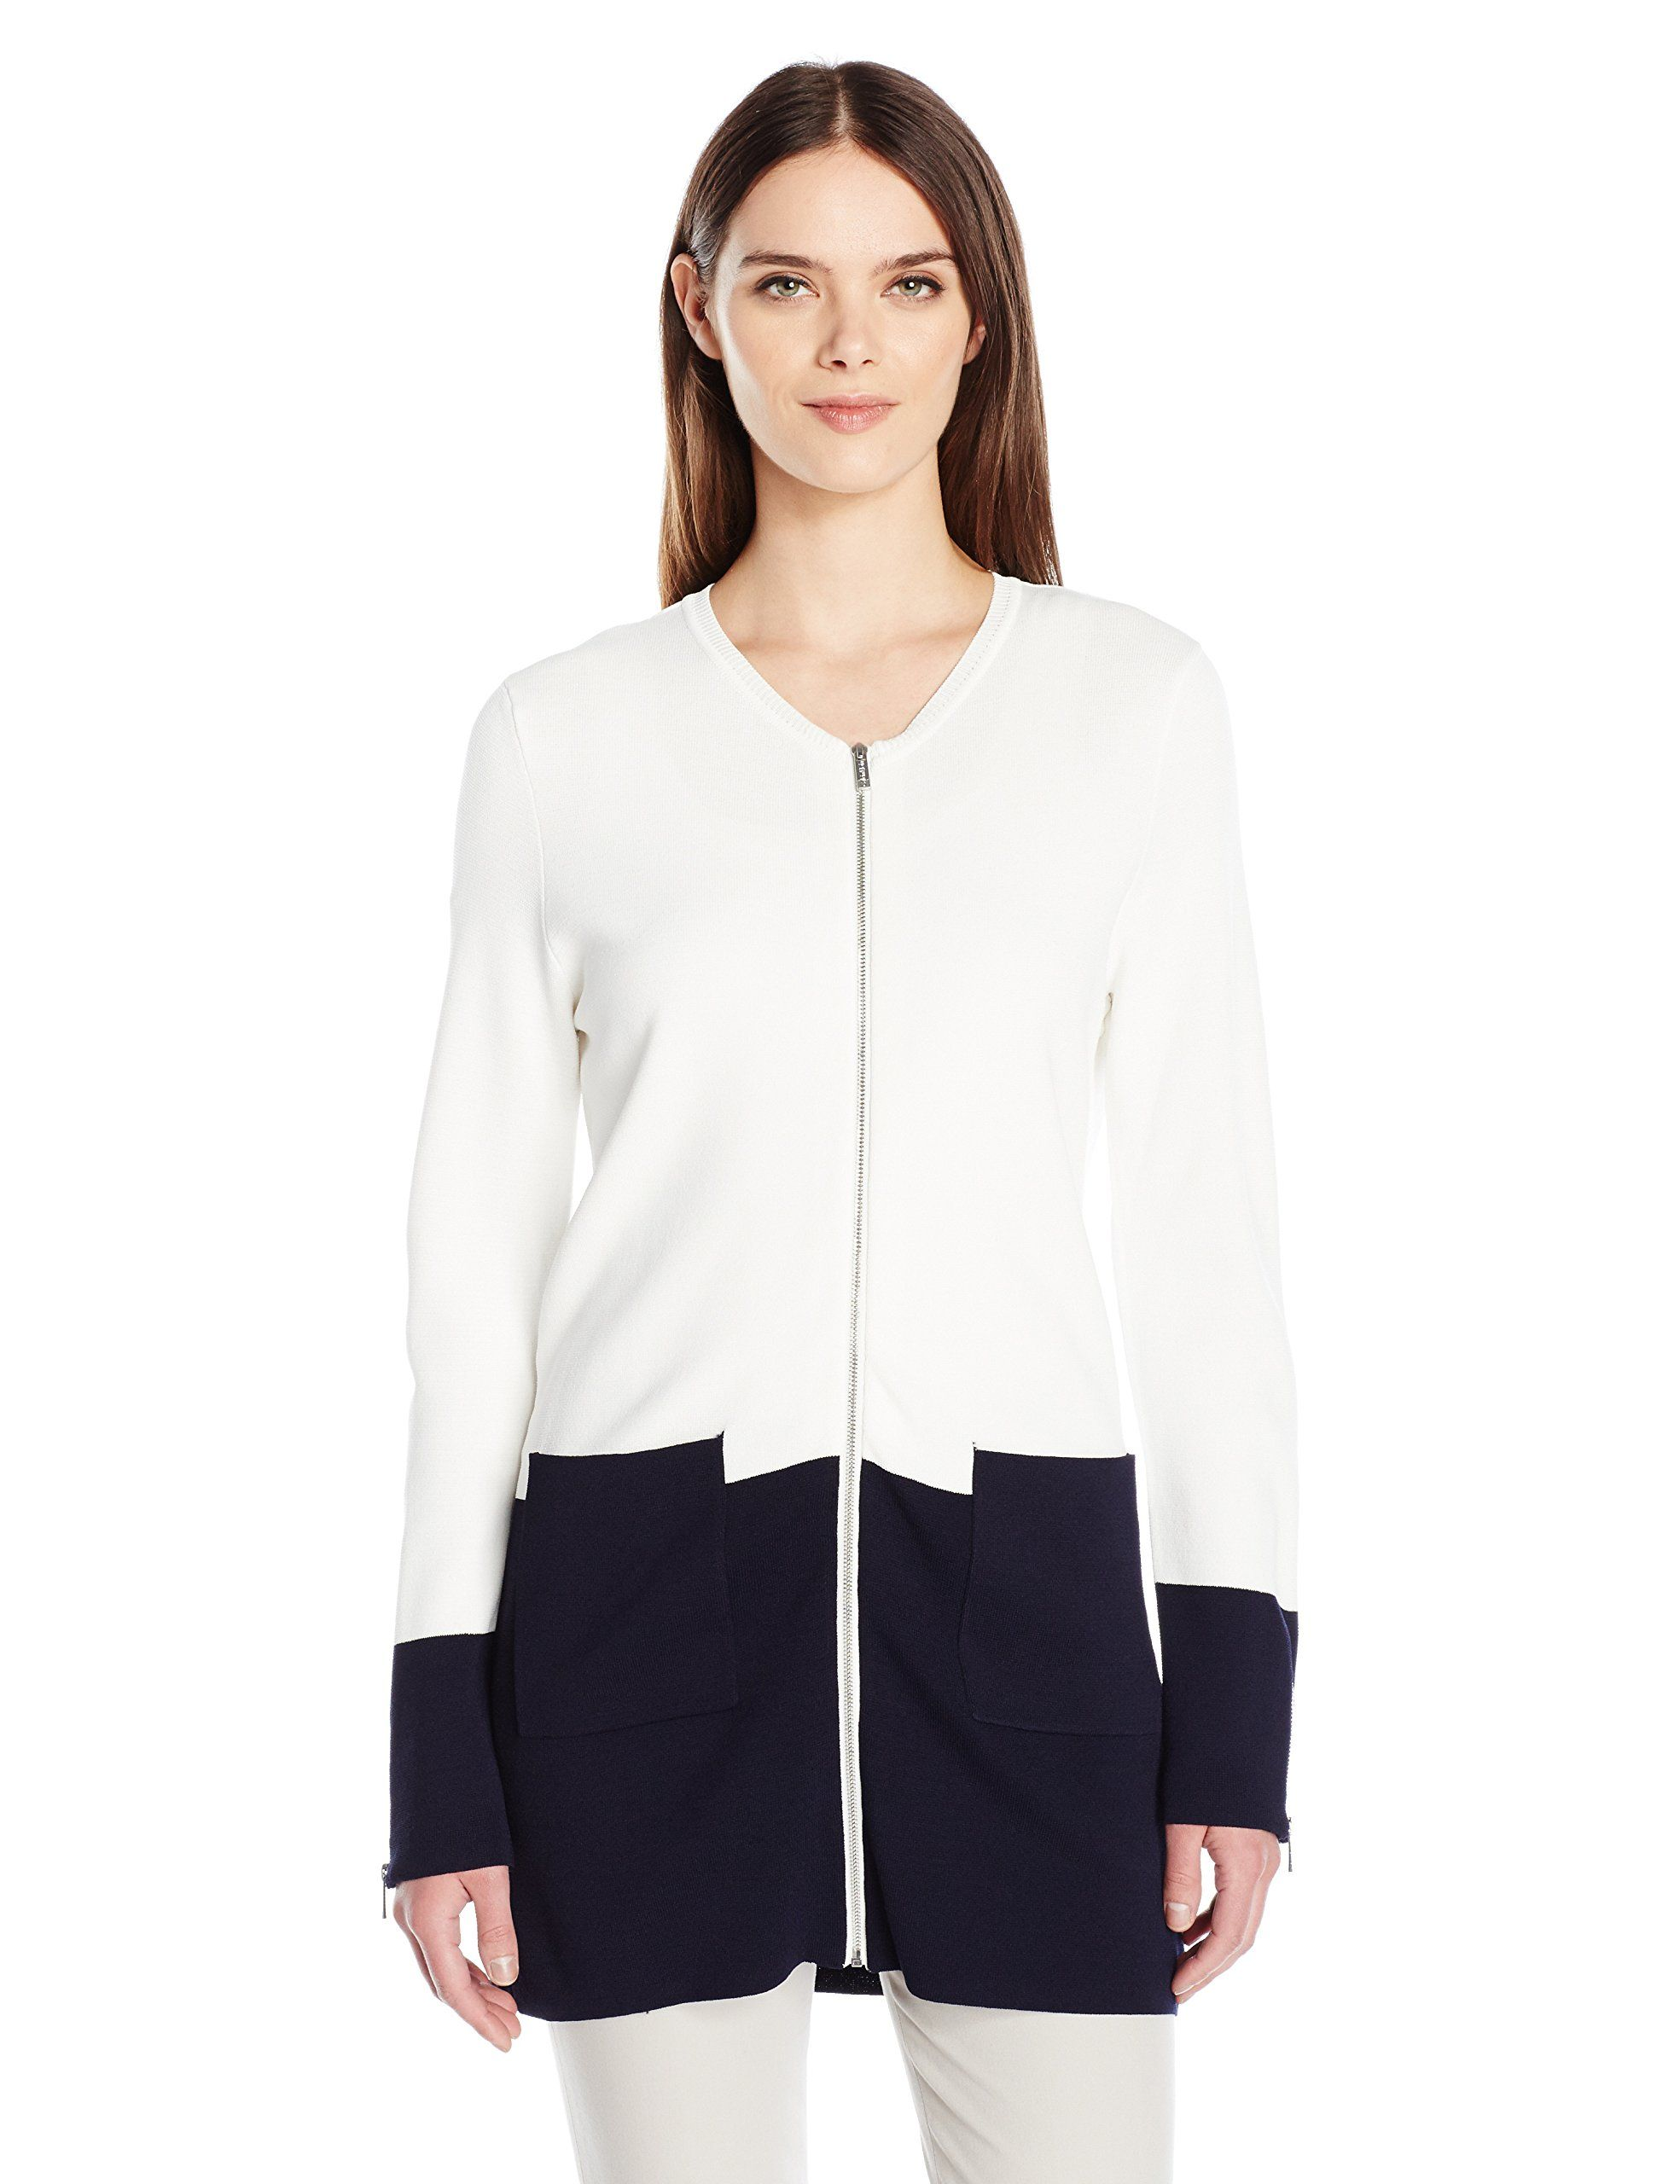 Calvin Klein Women's Long Colorblock Zip Cardigan, Soft White/Twilight Multi, L